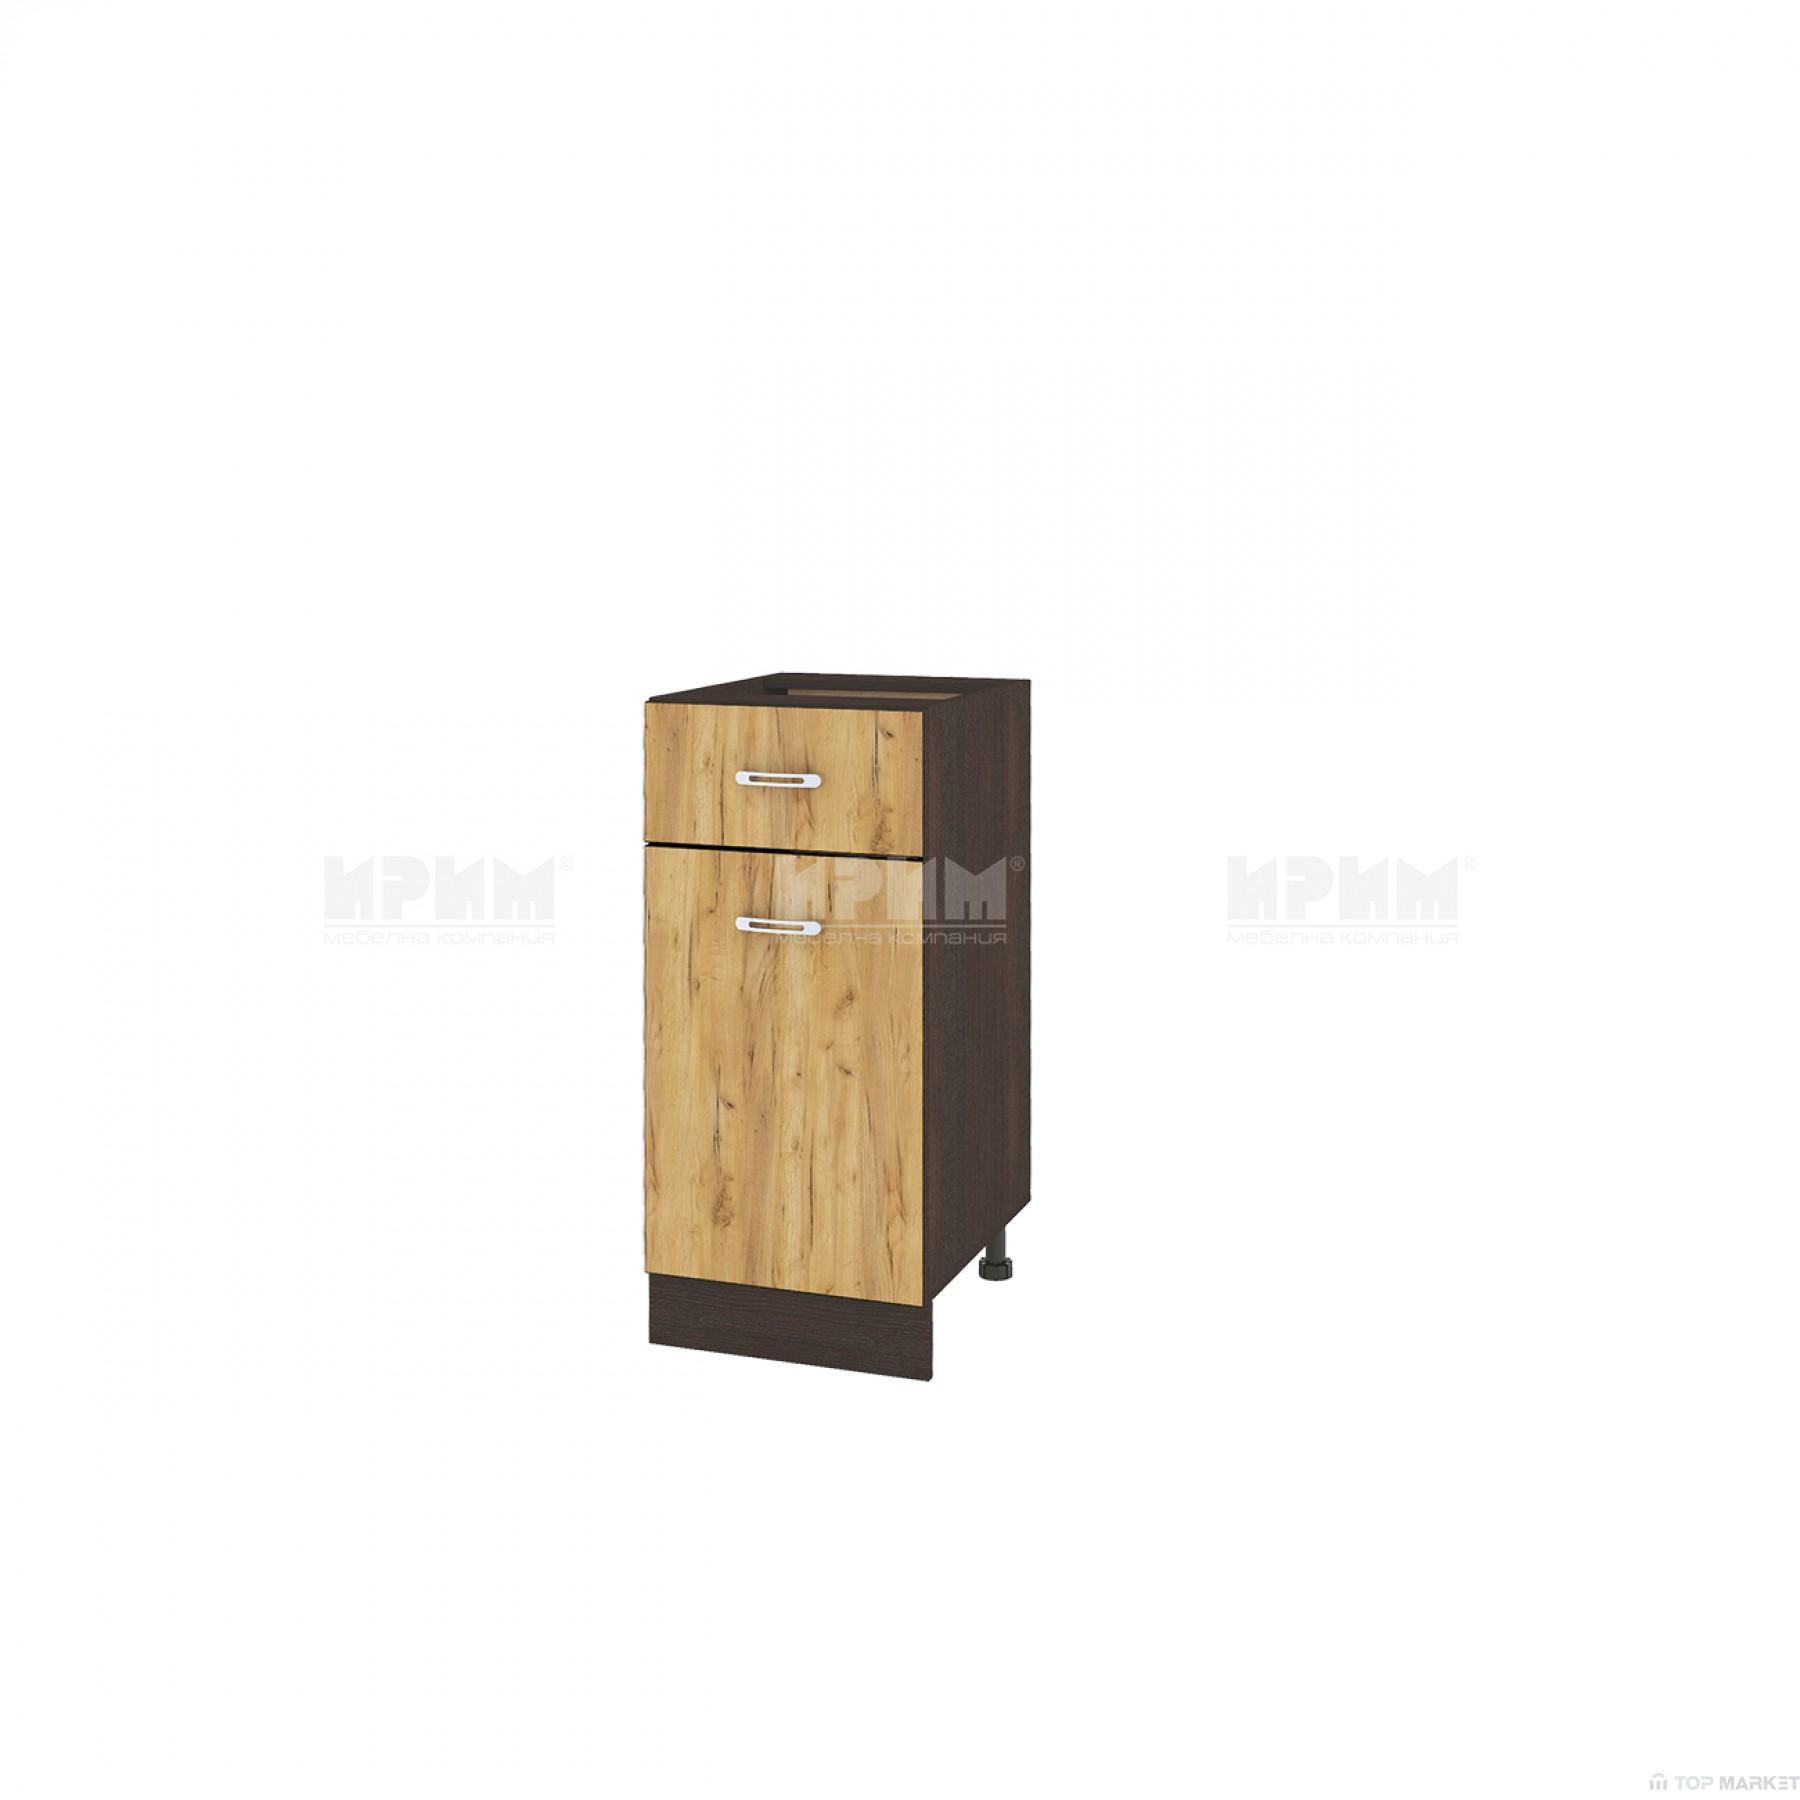 Долен шкаф City ВДД-24